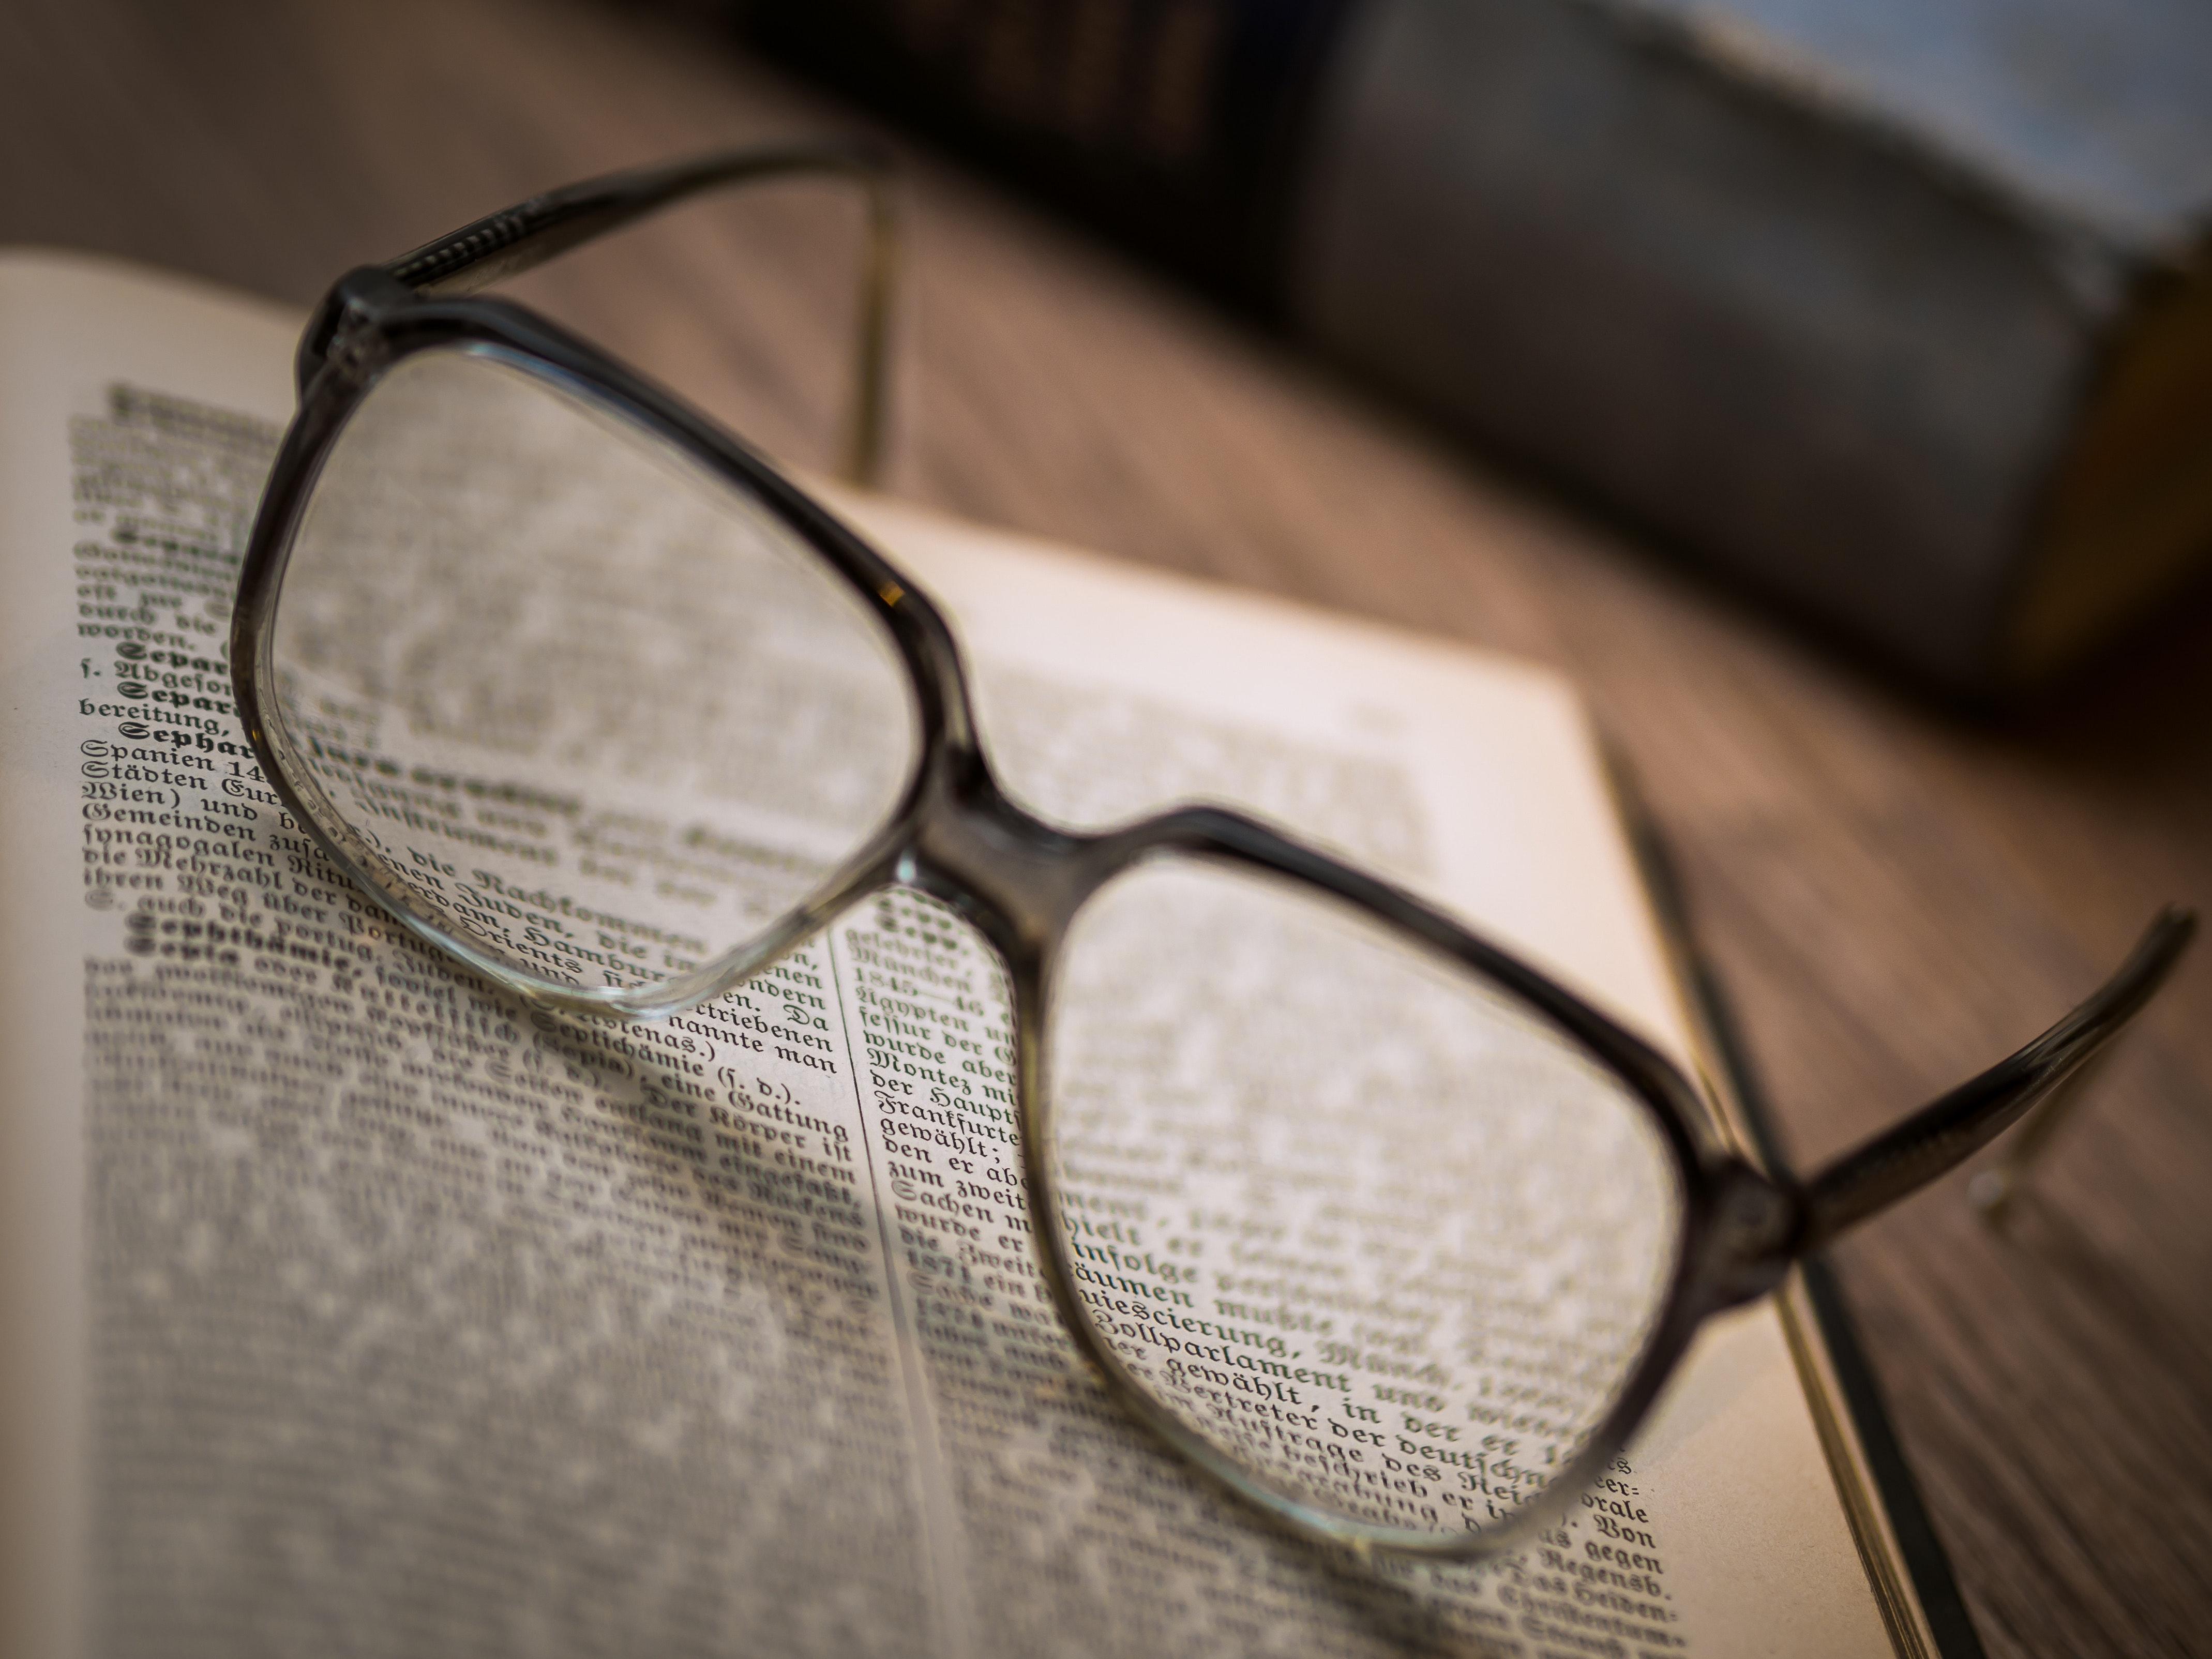 Close-up of Eyeglasses, School, Science, Retro, Study, HQ Photo